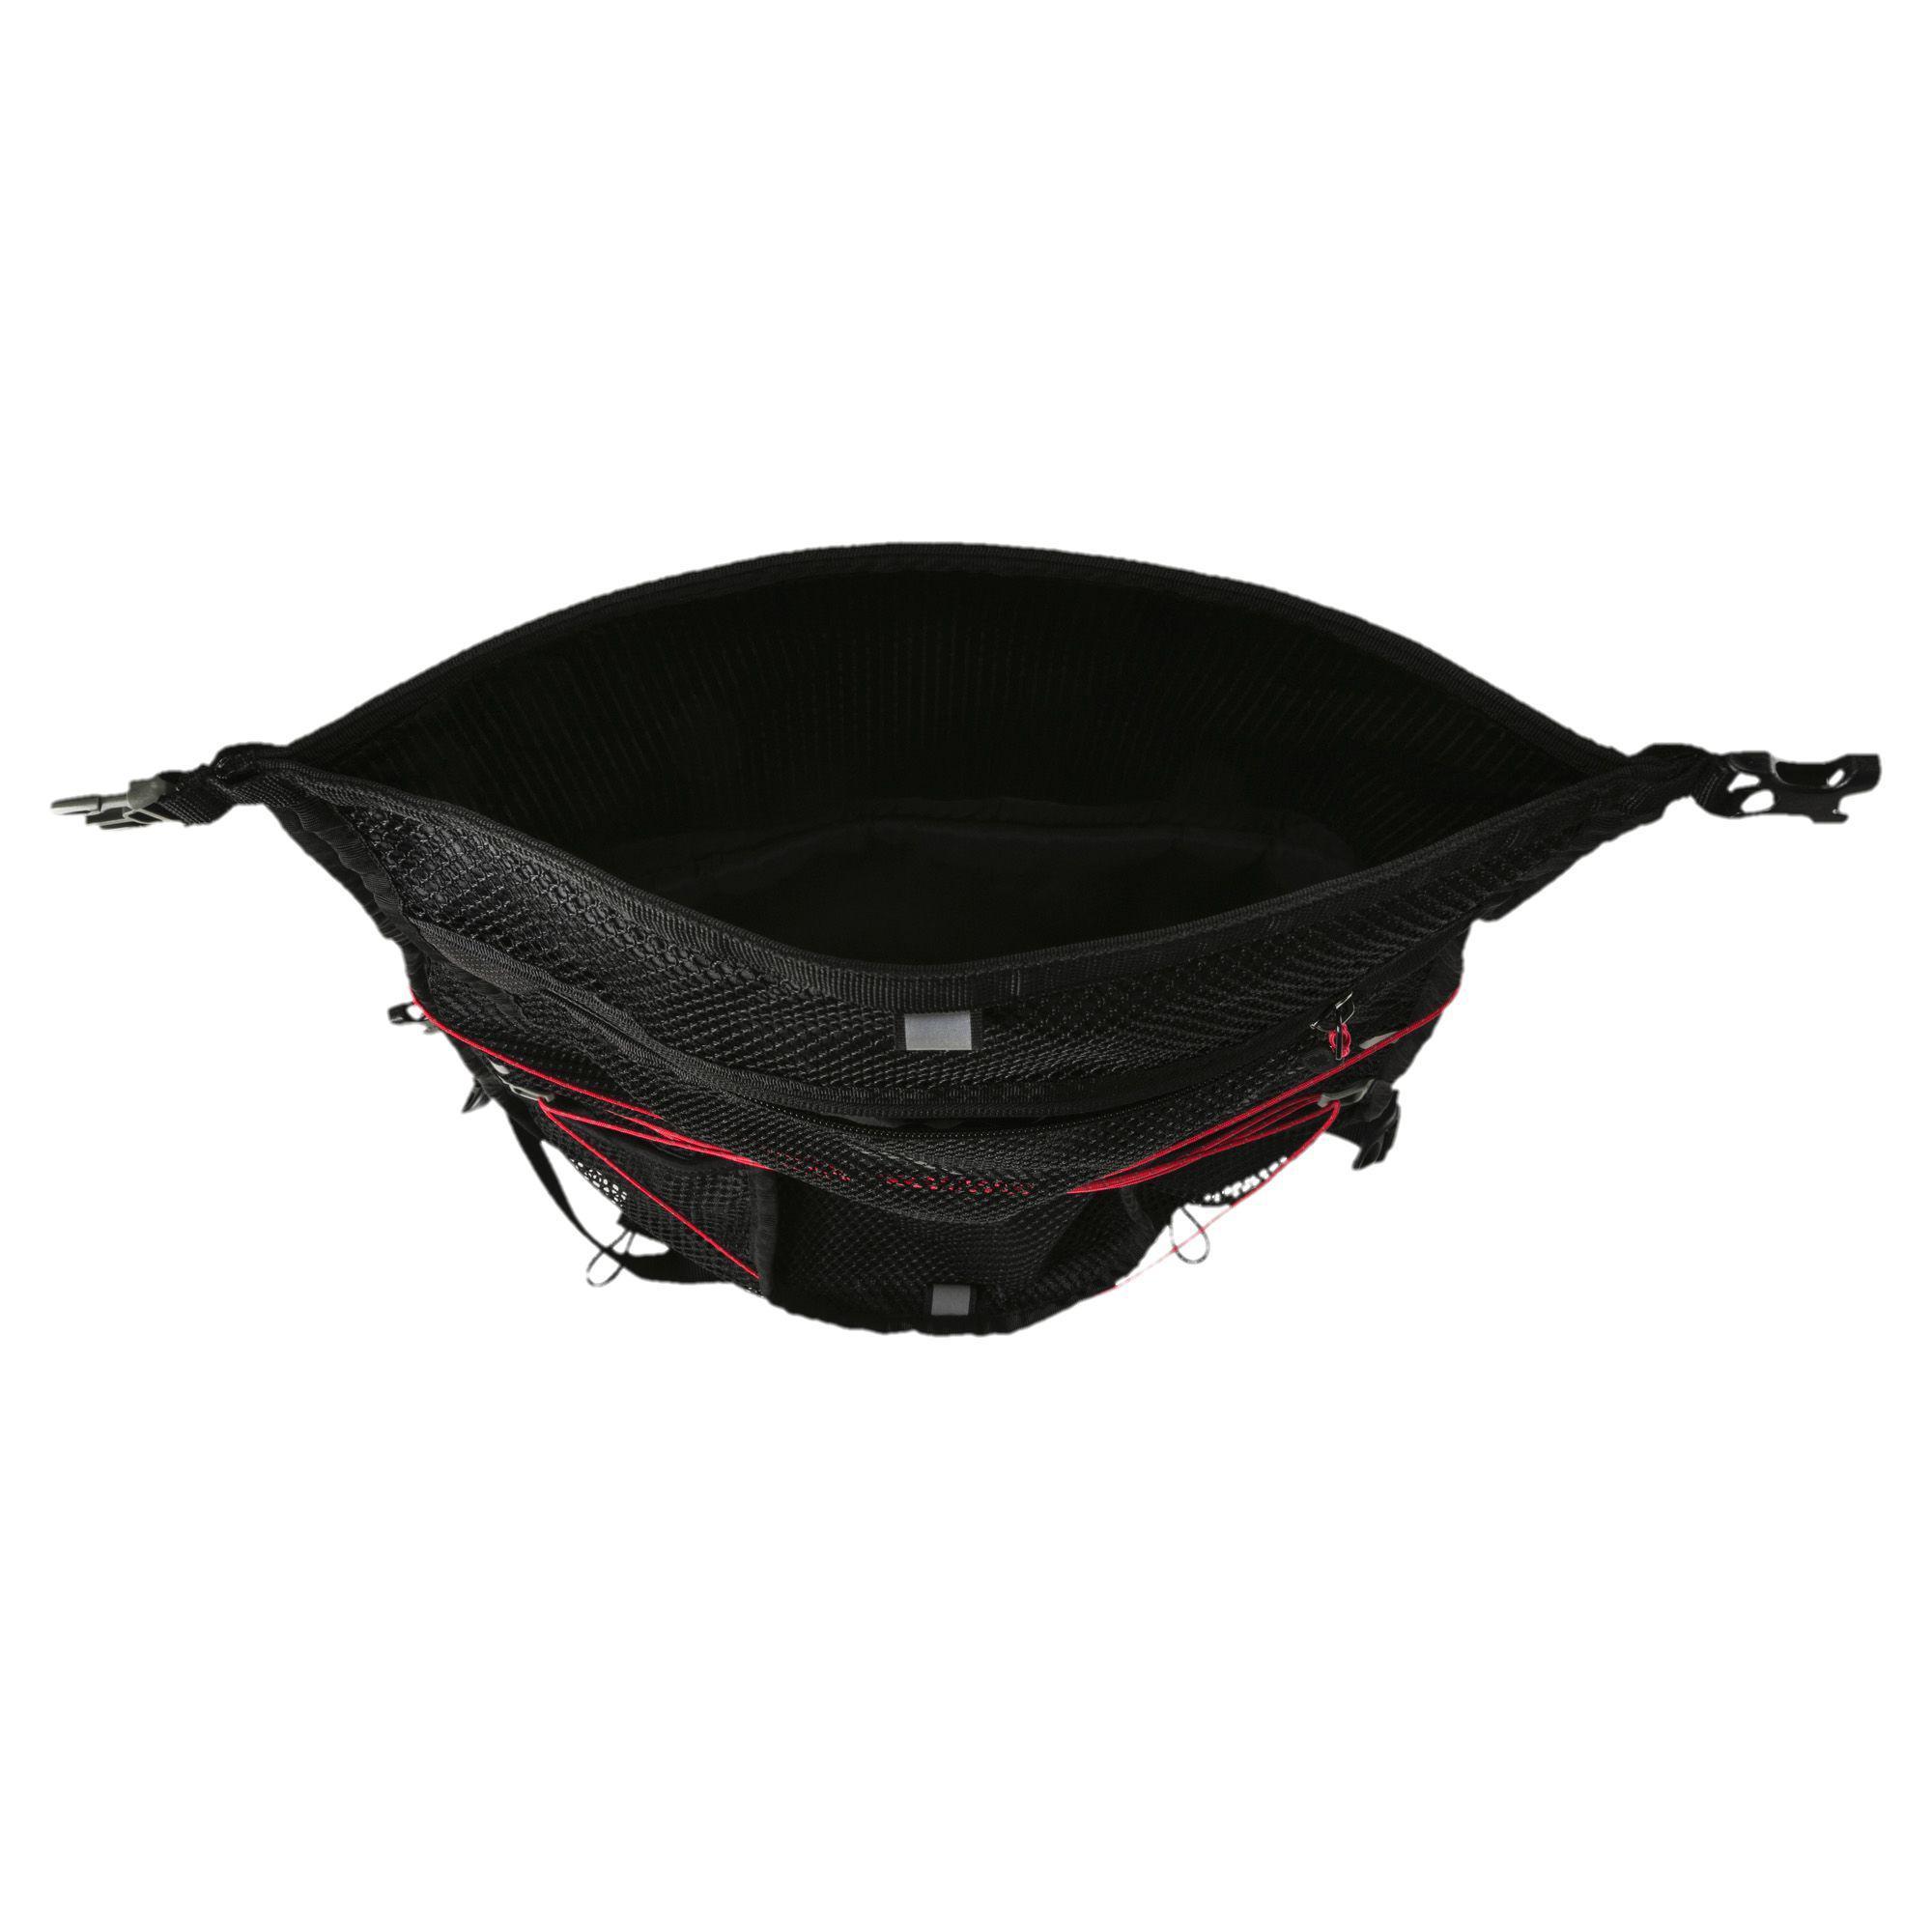 8a5efbb4e1 Lyst - PUMA Pr Netfit Backpack in Black for Men